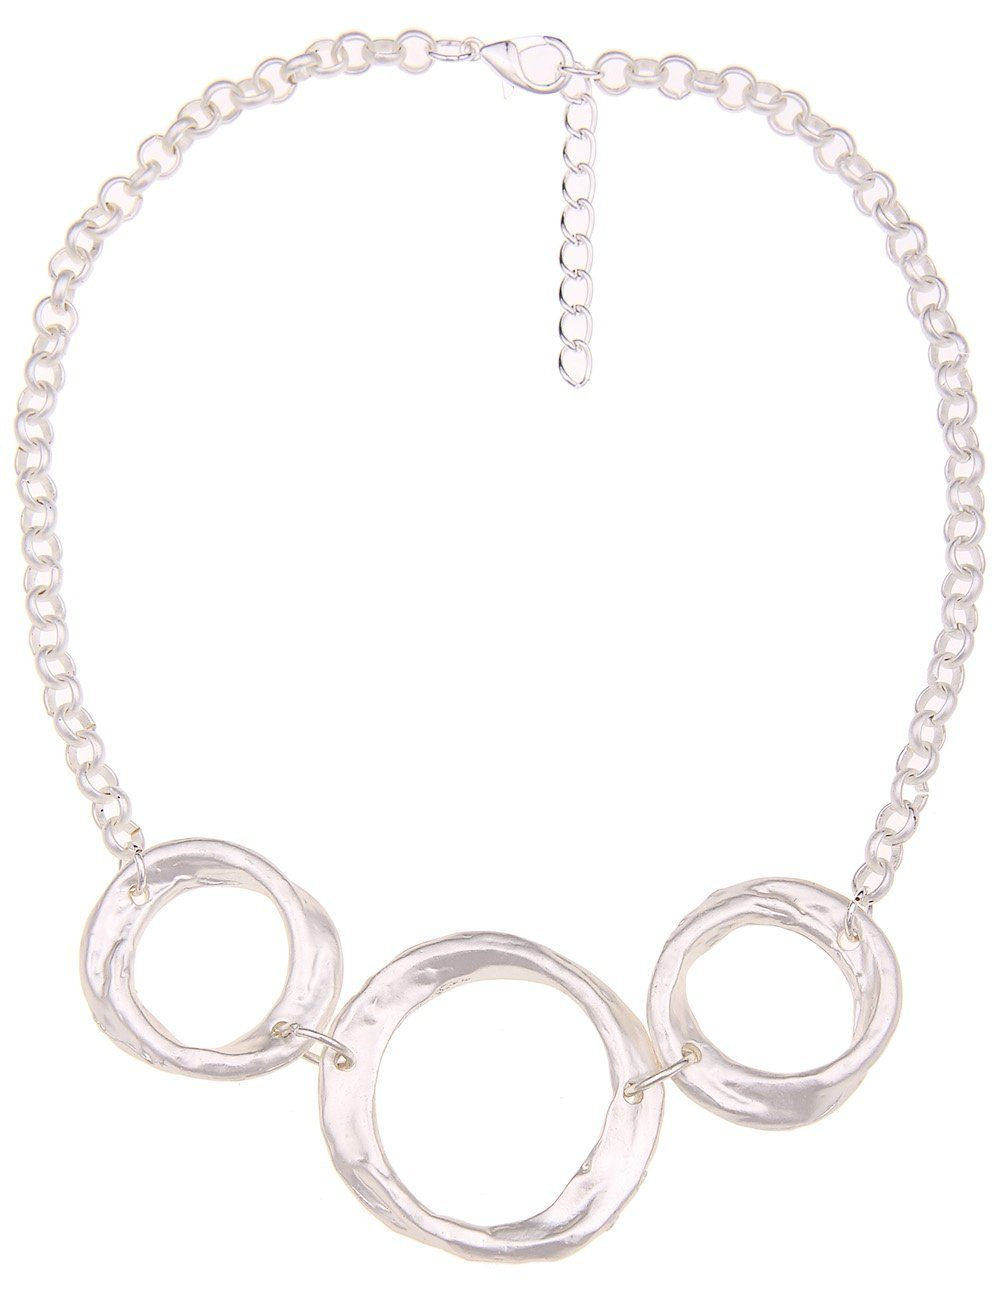 Leslii Halskette in auffälligem Design